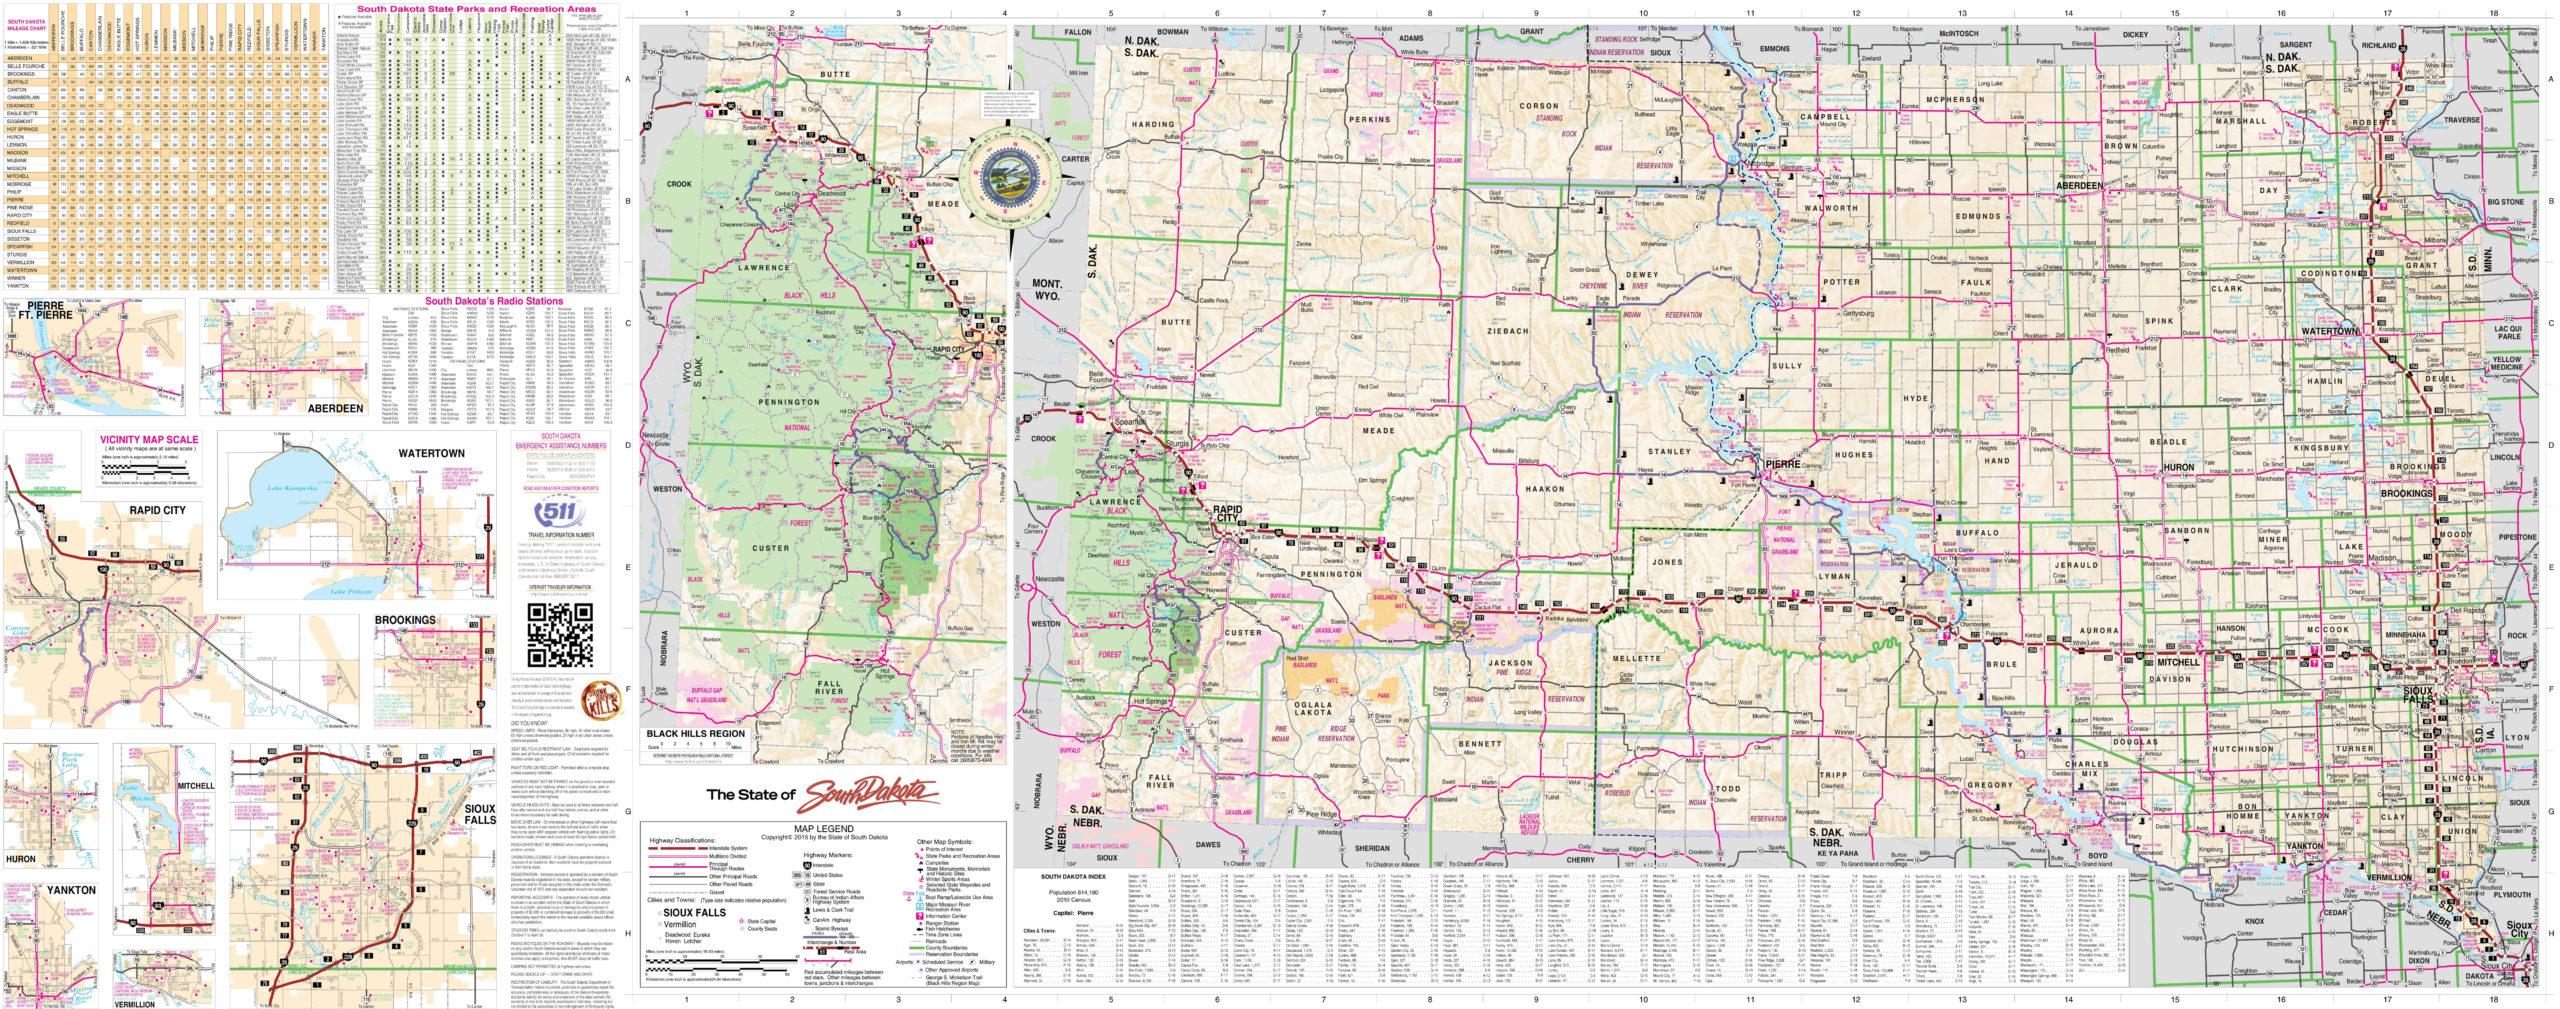 Map Of South Dakota Full Size Gifex